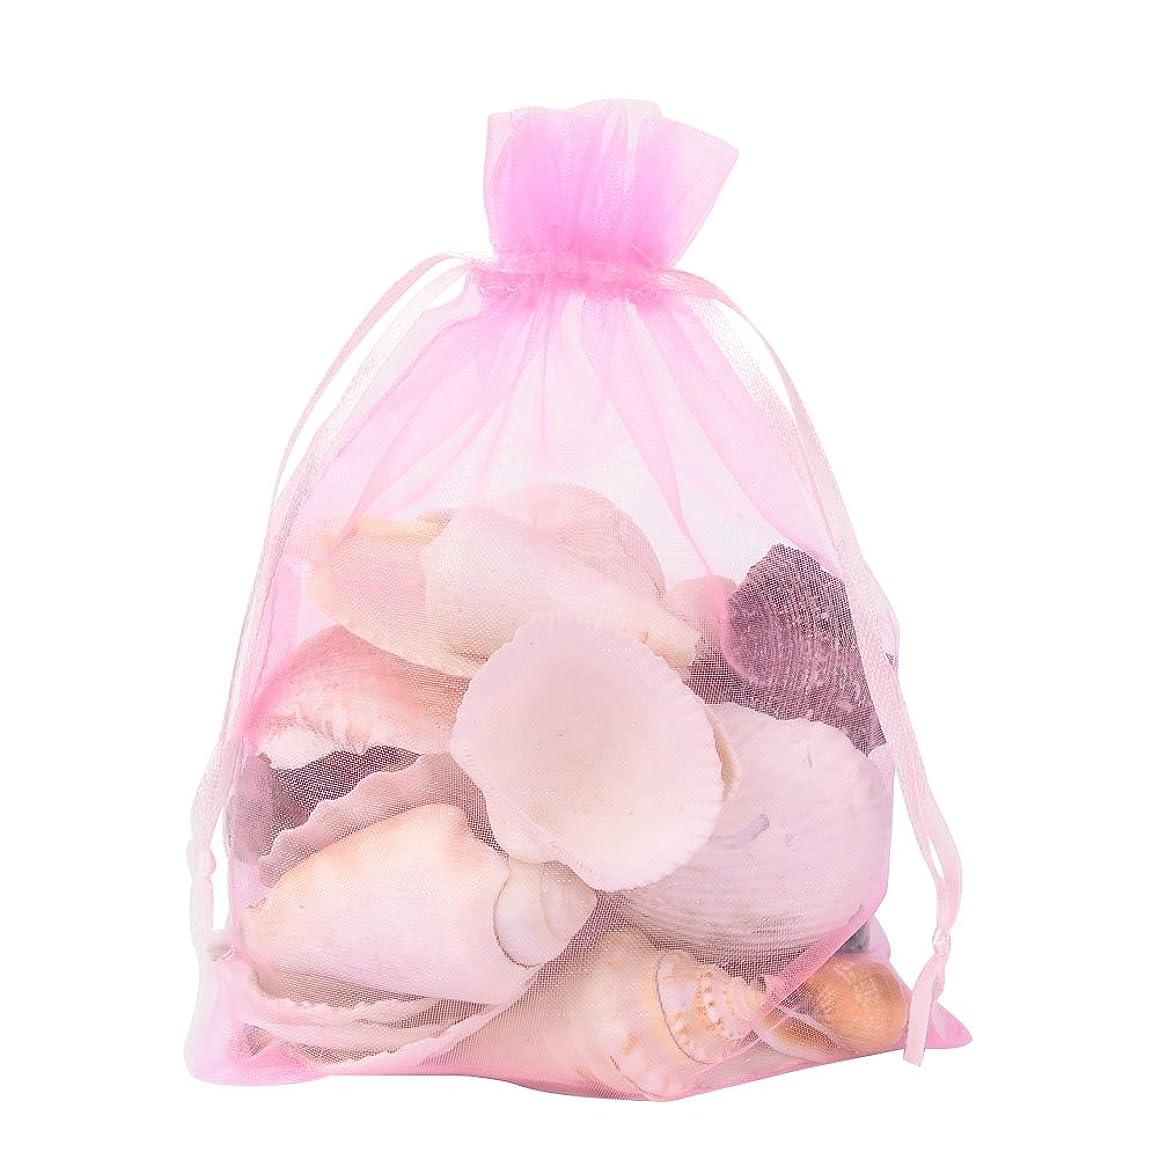 Pandahall 100 PCS 5x7 inch Pink Organza Drawstring Bags Party Wedding Favor Gift Bags